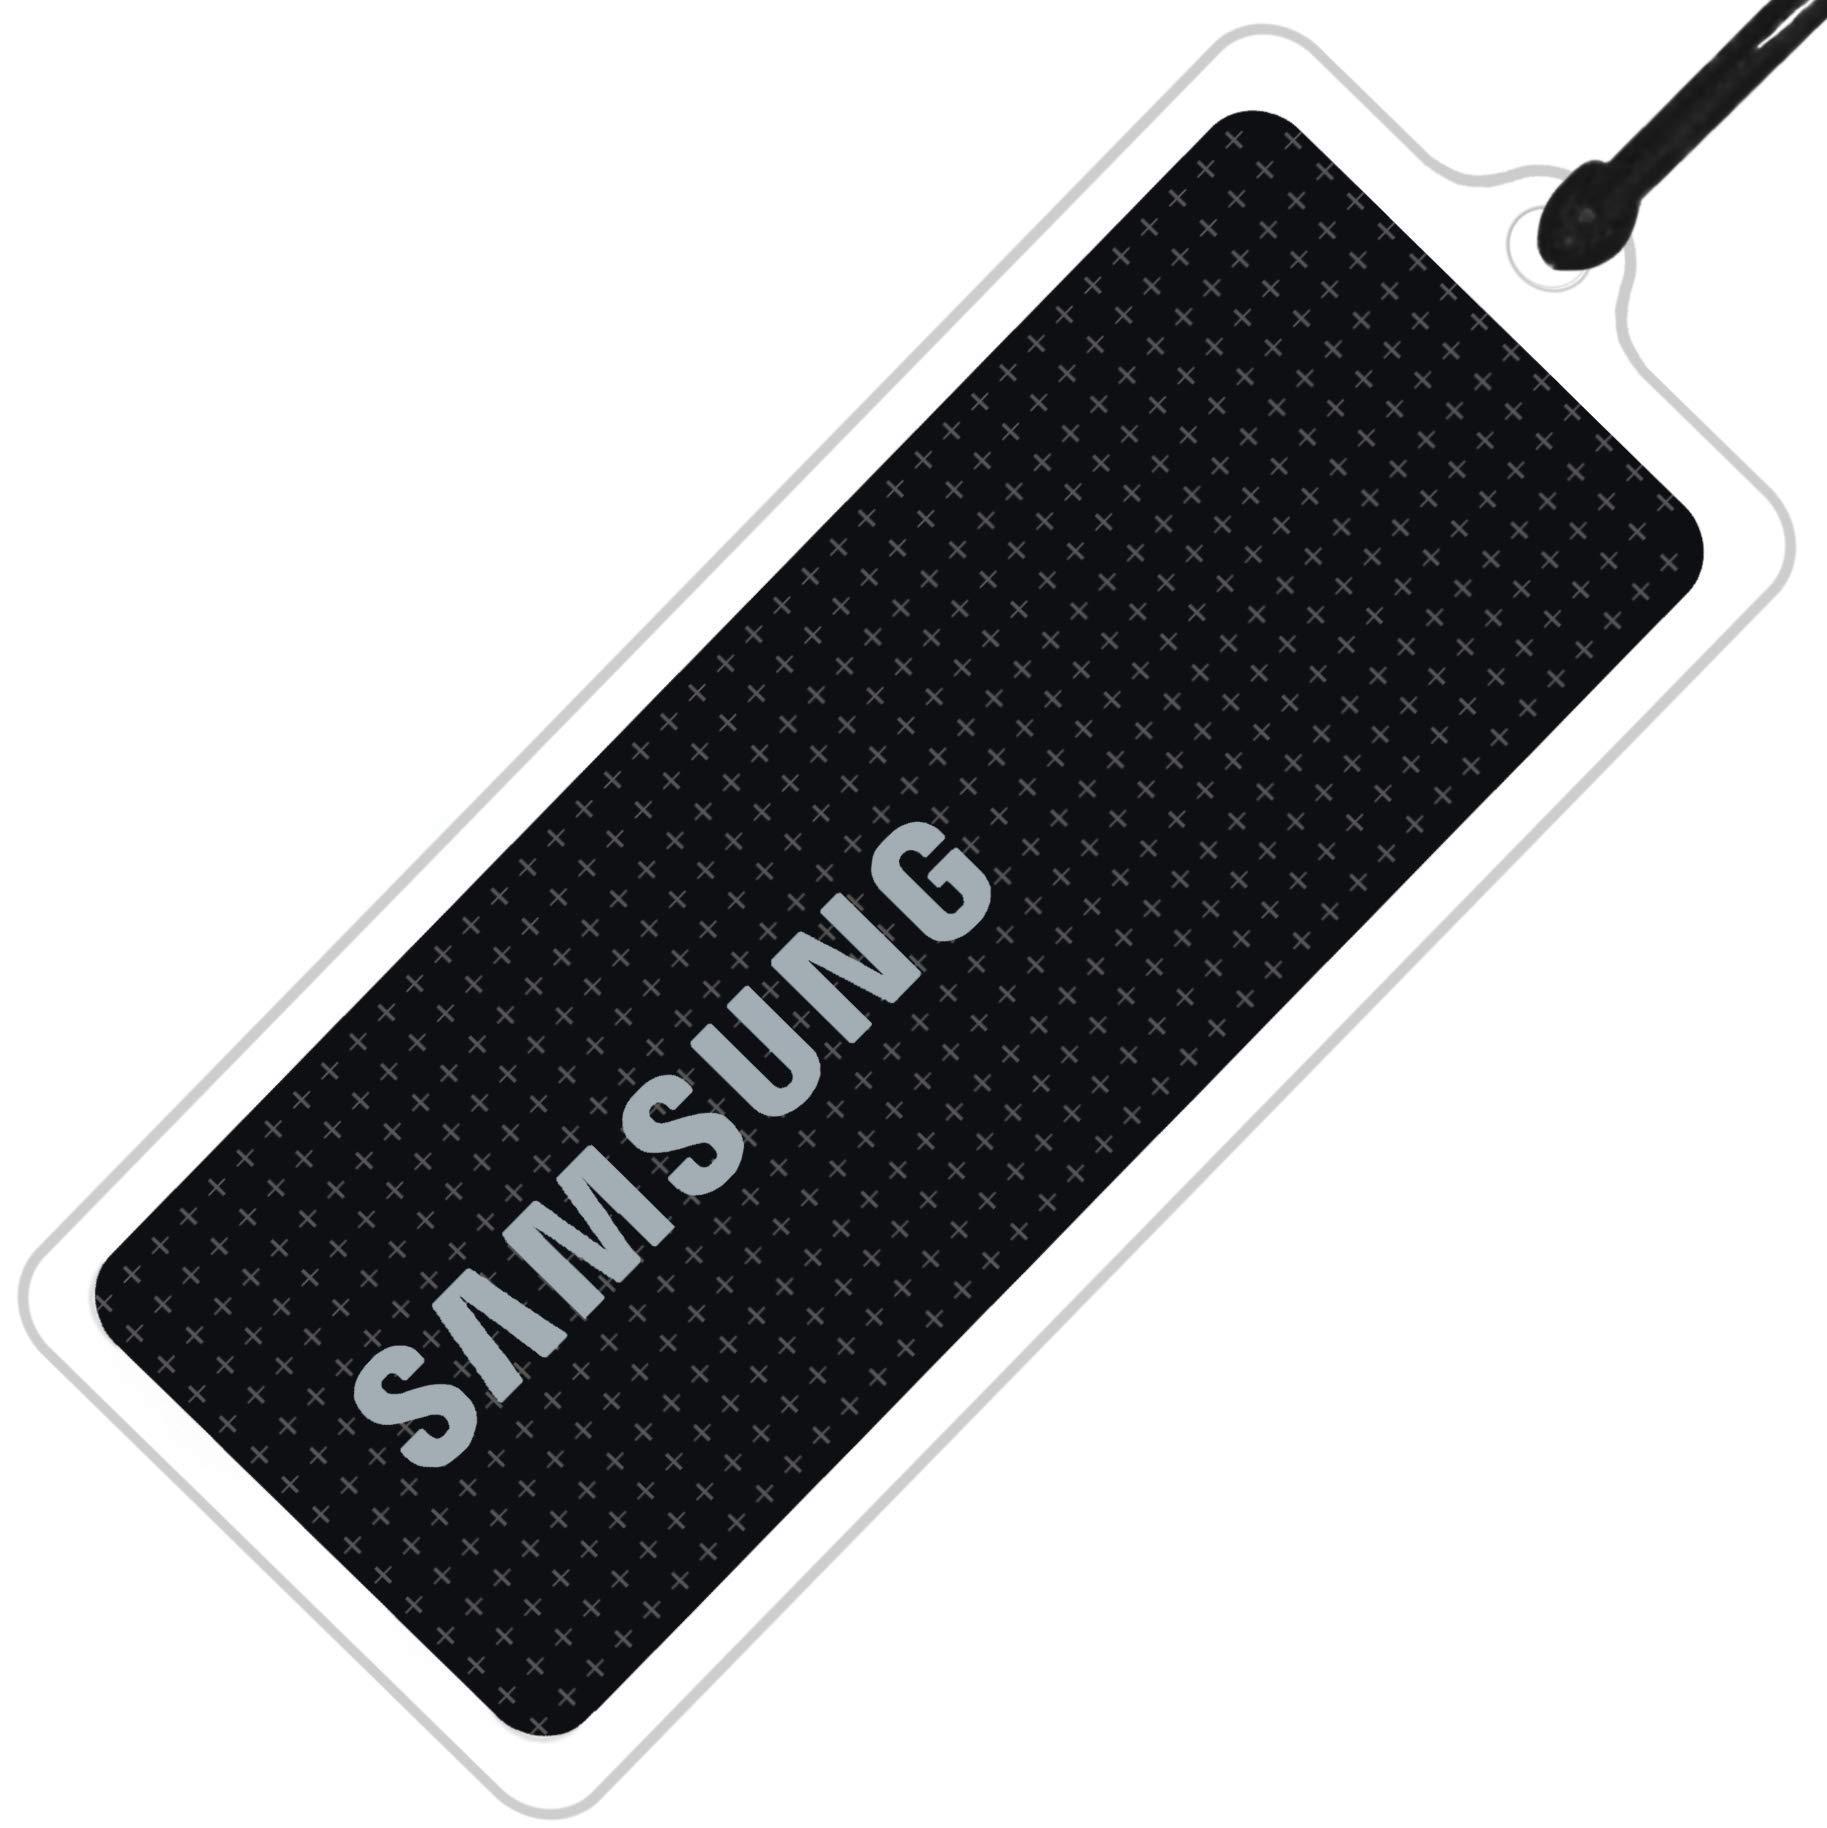 Samsung RFID Tag (Black), Key for Samsung Door Locks